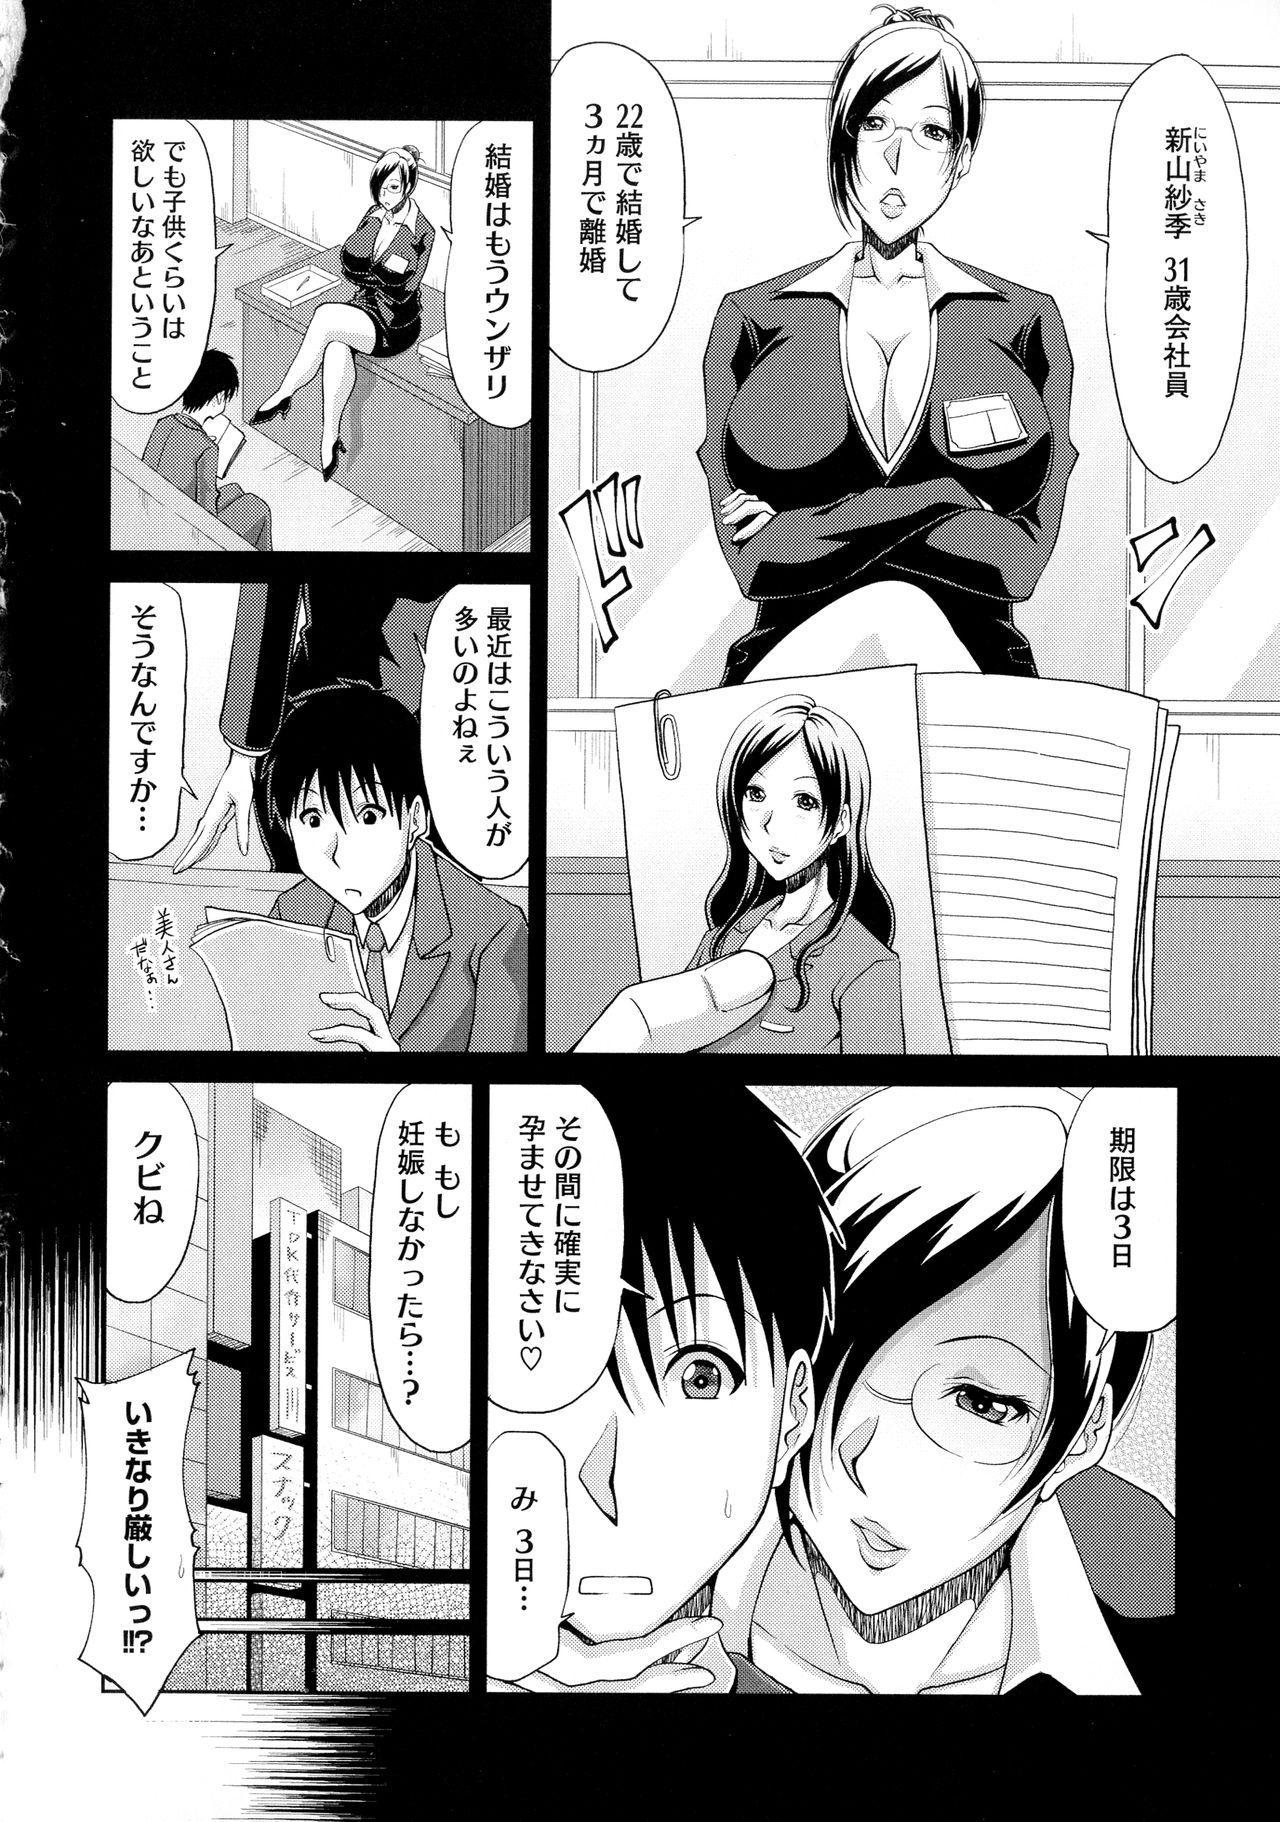 Haramase! 174